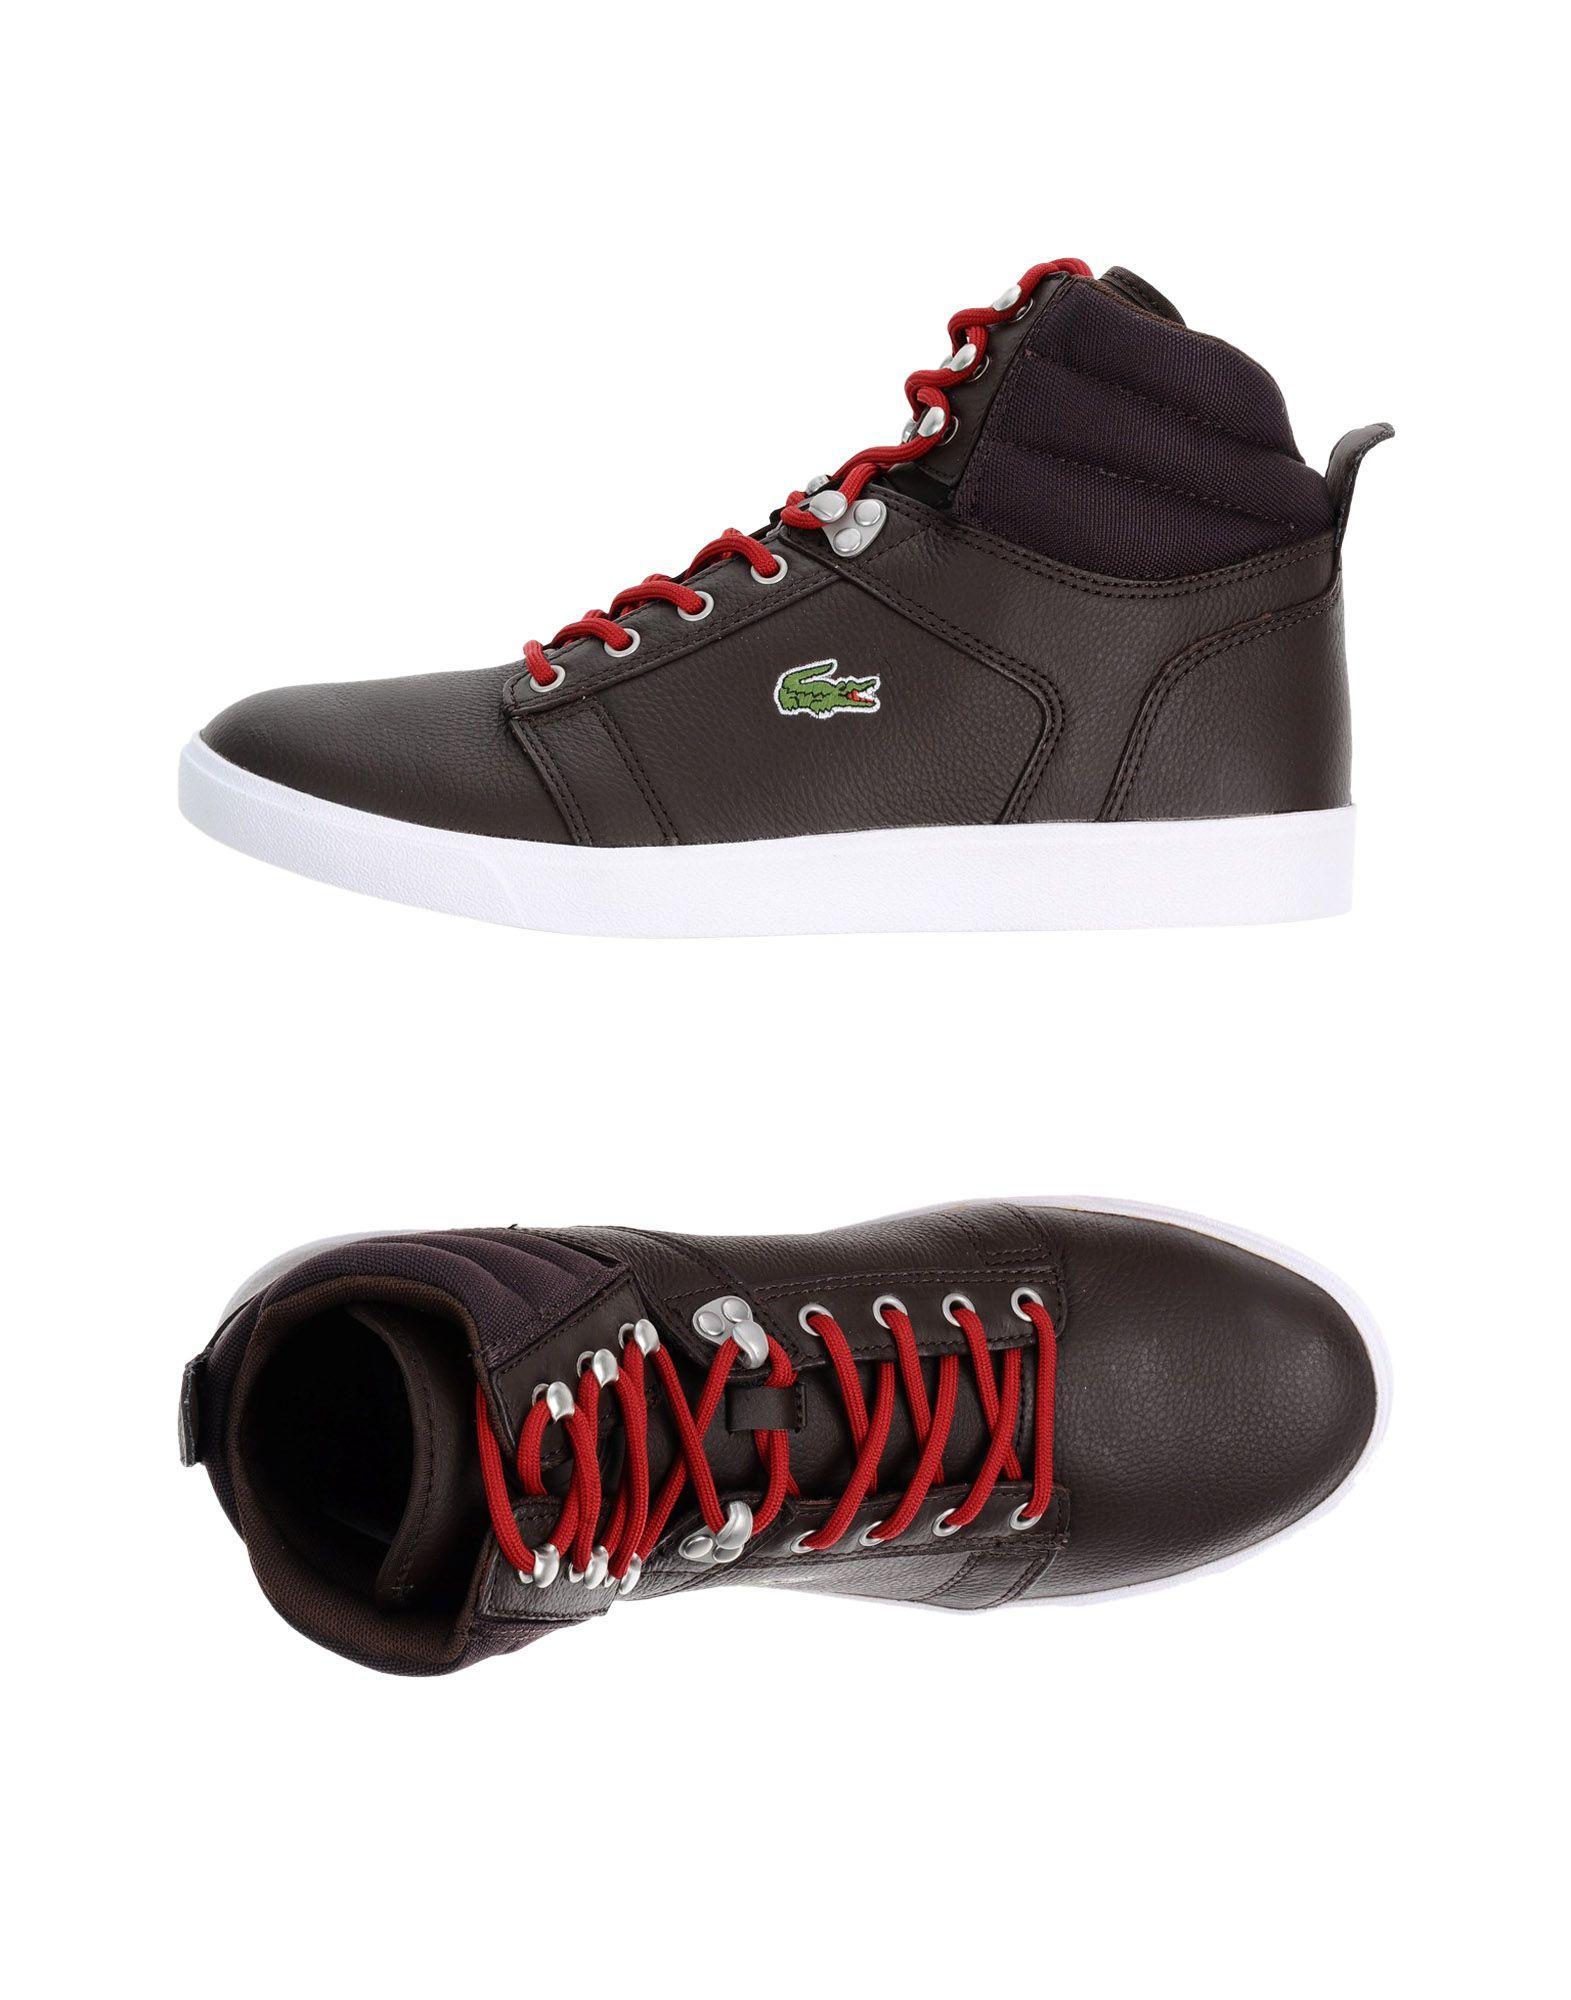 lyst lacoste sport hightops amp sneakers in brown for men